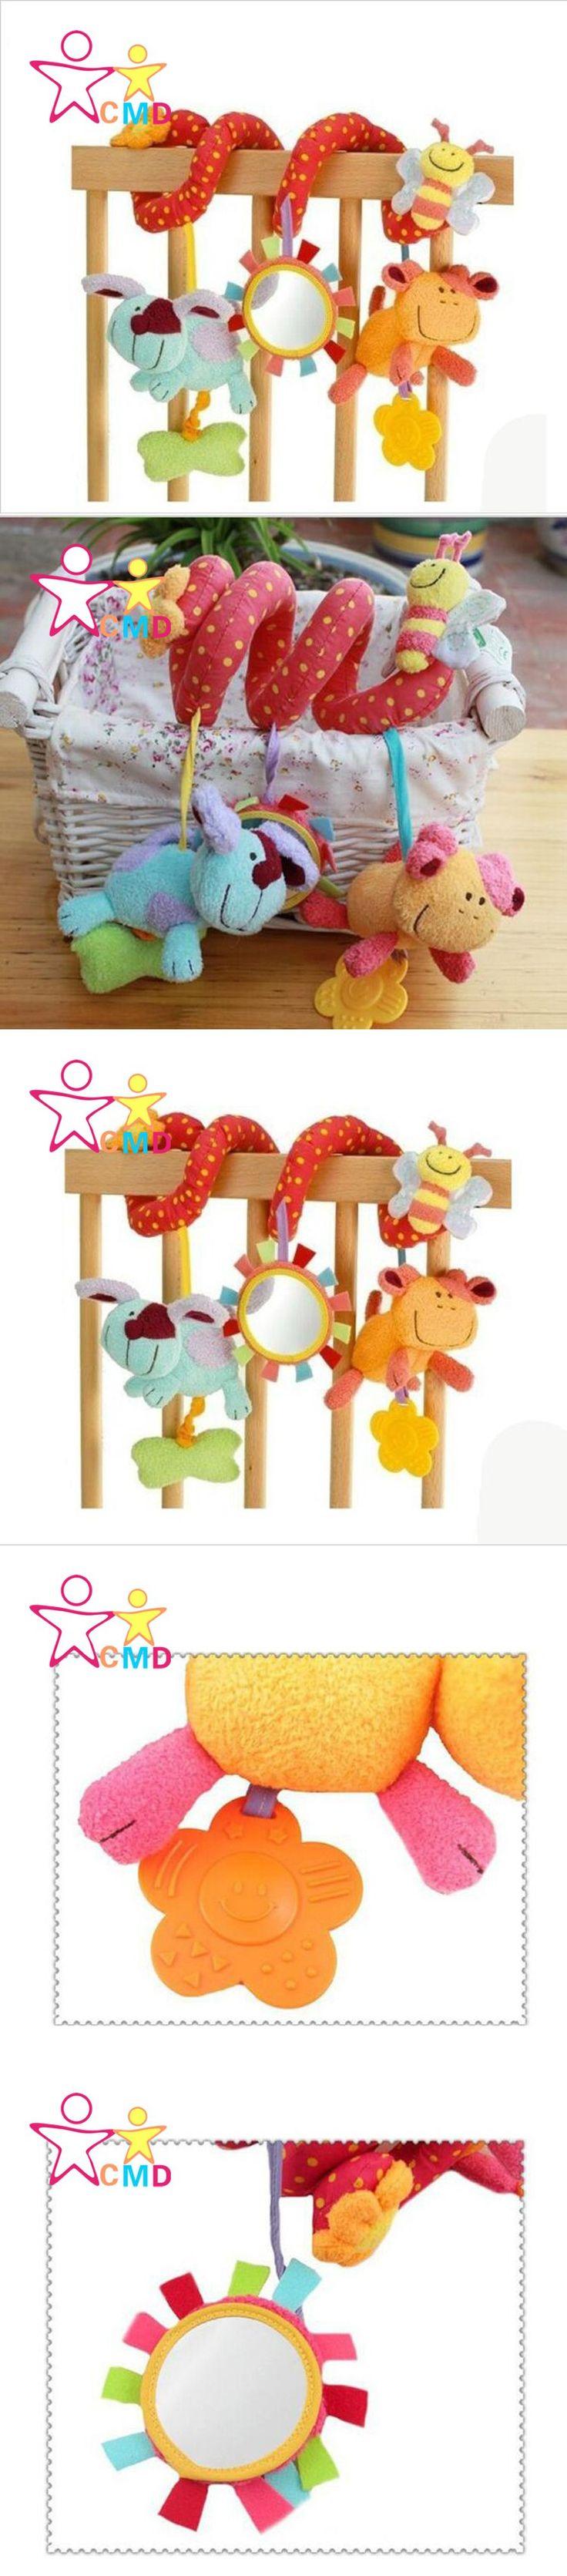 1pcs/lot ELC Baby Toy,Multifunctional Animals Around/Lathe Bed Hang.Safety Mirrors/BB Device/Teeth Glue/Take Pull ShockHT82600MU $10.35